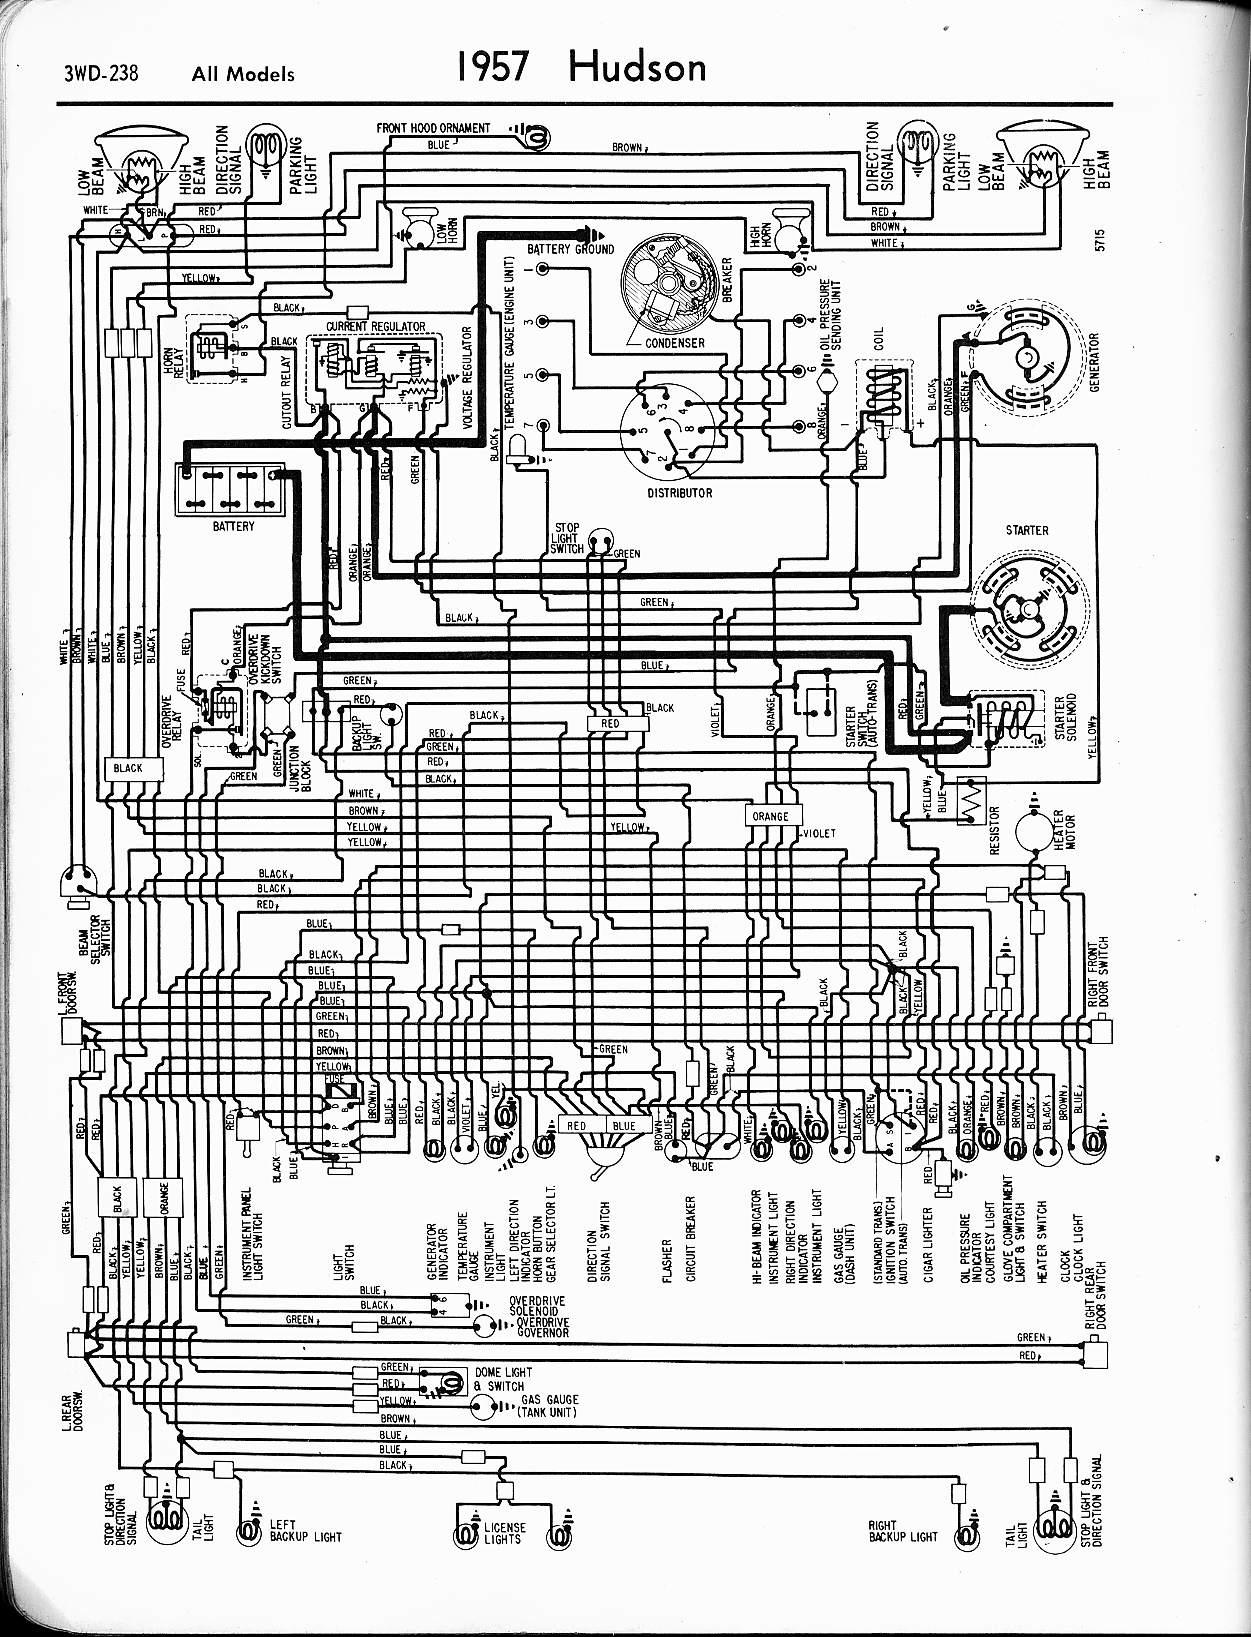 Magnificent Hudson Trailer Light Wiring Diagram Hudson Brothers Trailer Wiring Wiring Database Ittabxeroyuccorg